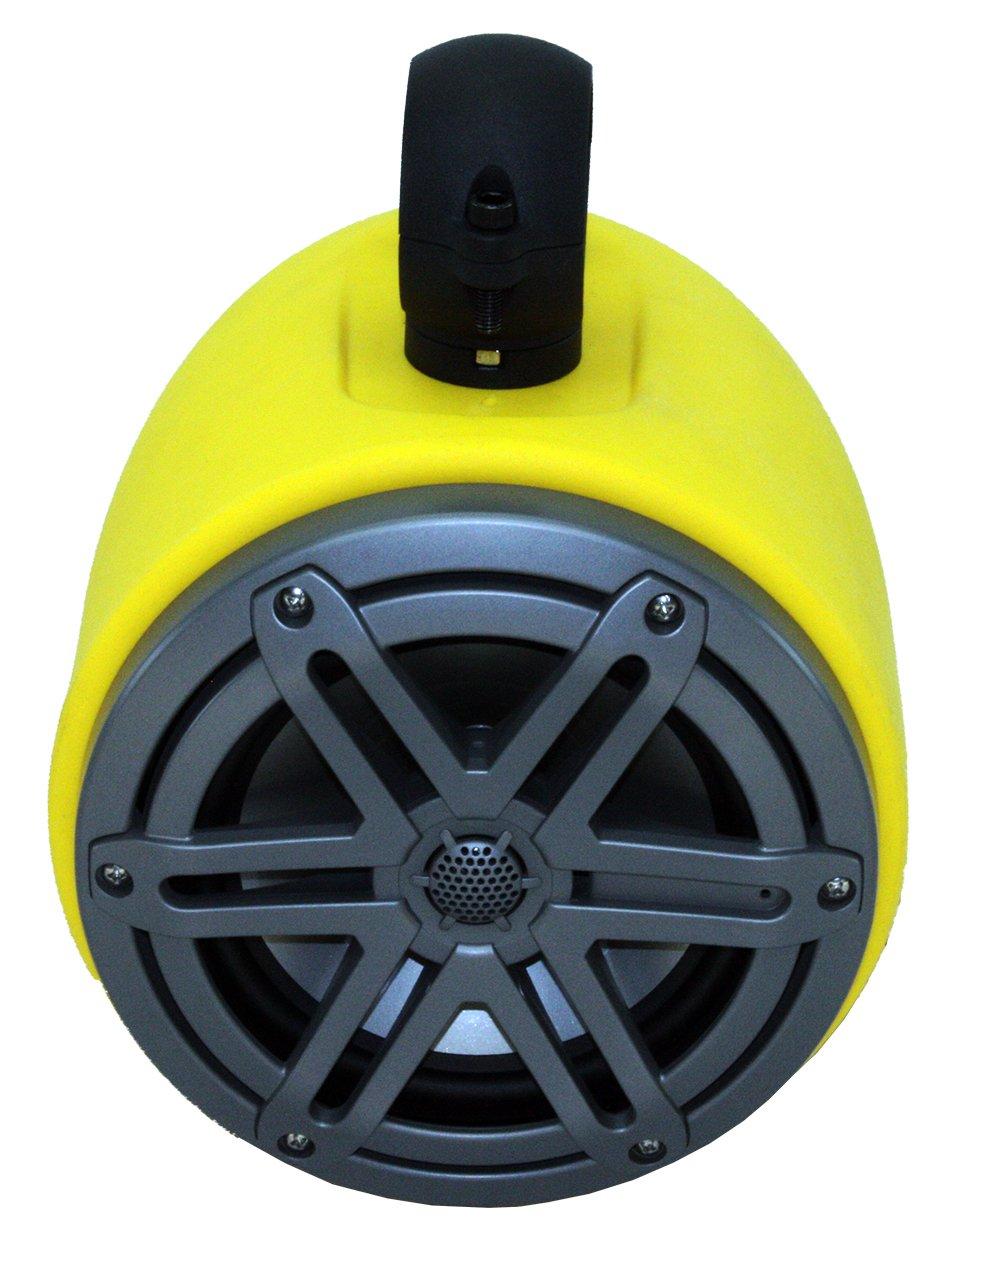 Froghead Industries WAKE865 Wake Tower Speaker Pair With Versatile Mounting Hardware And JL Audio Marine Speakers